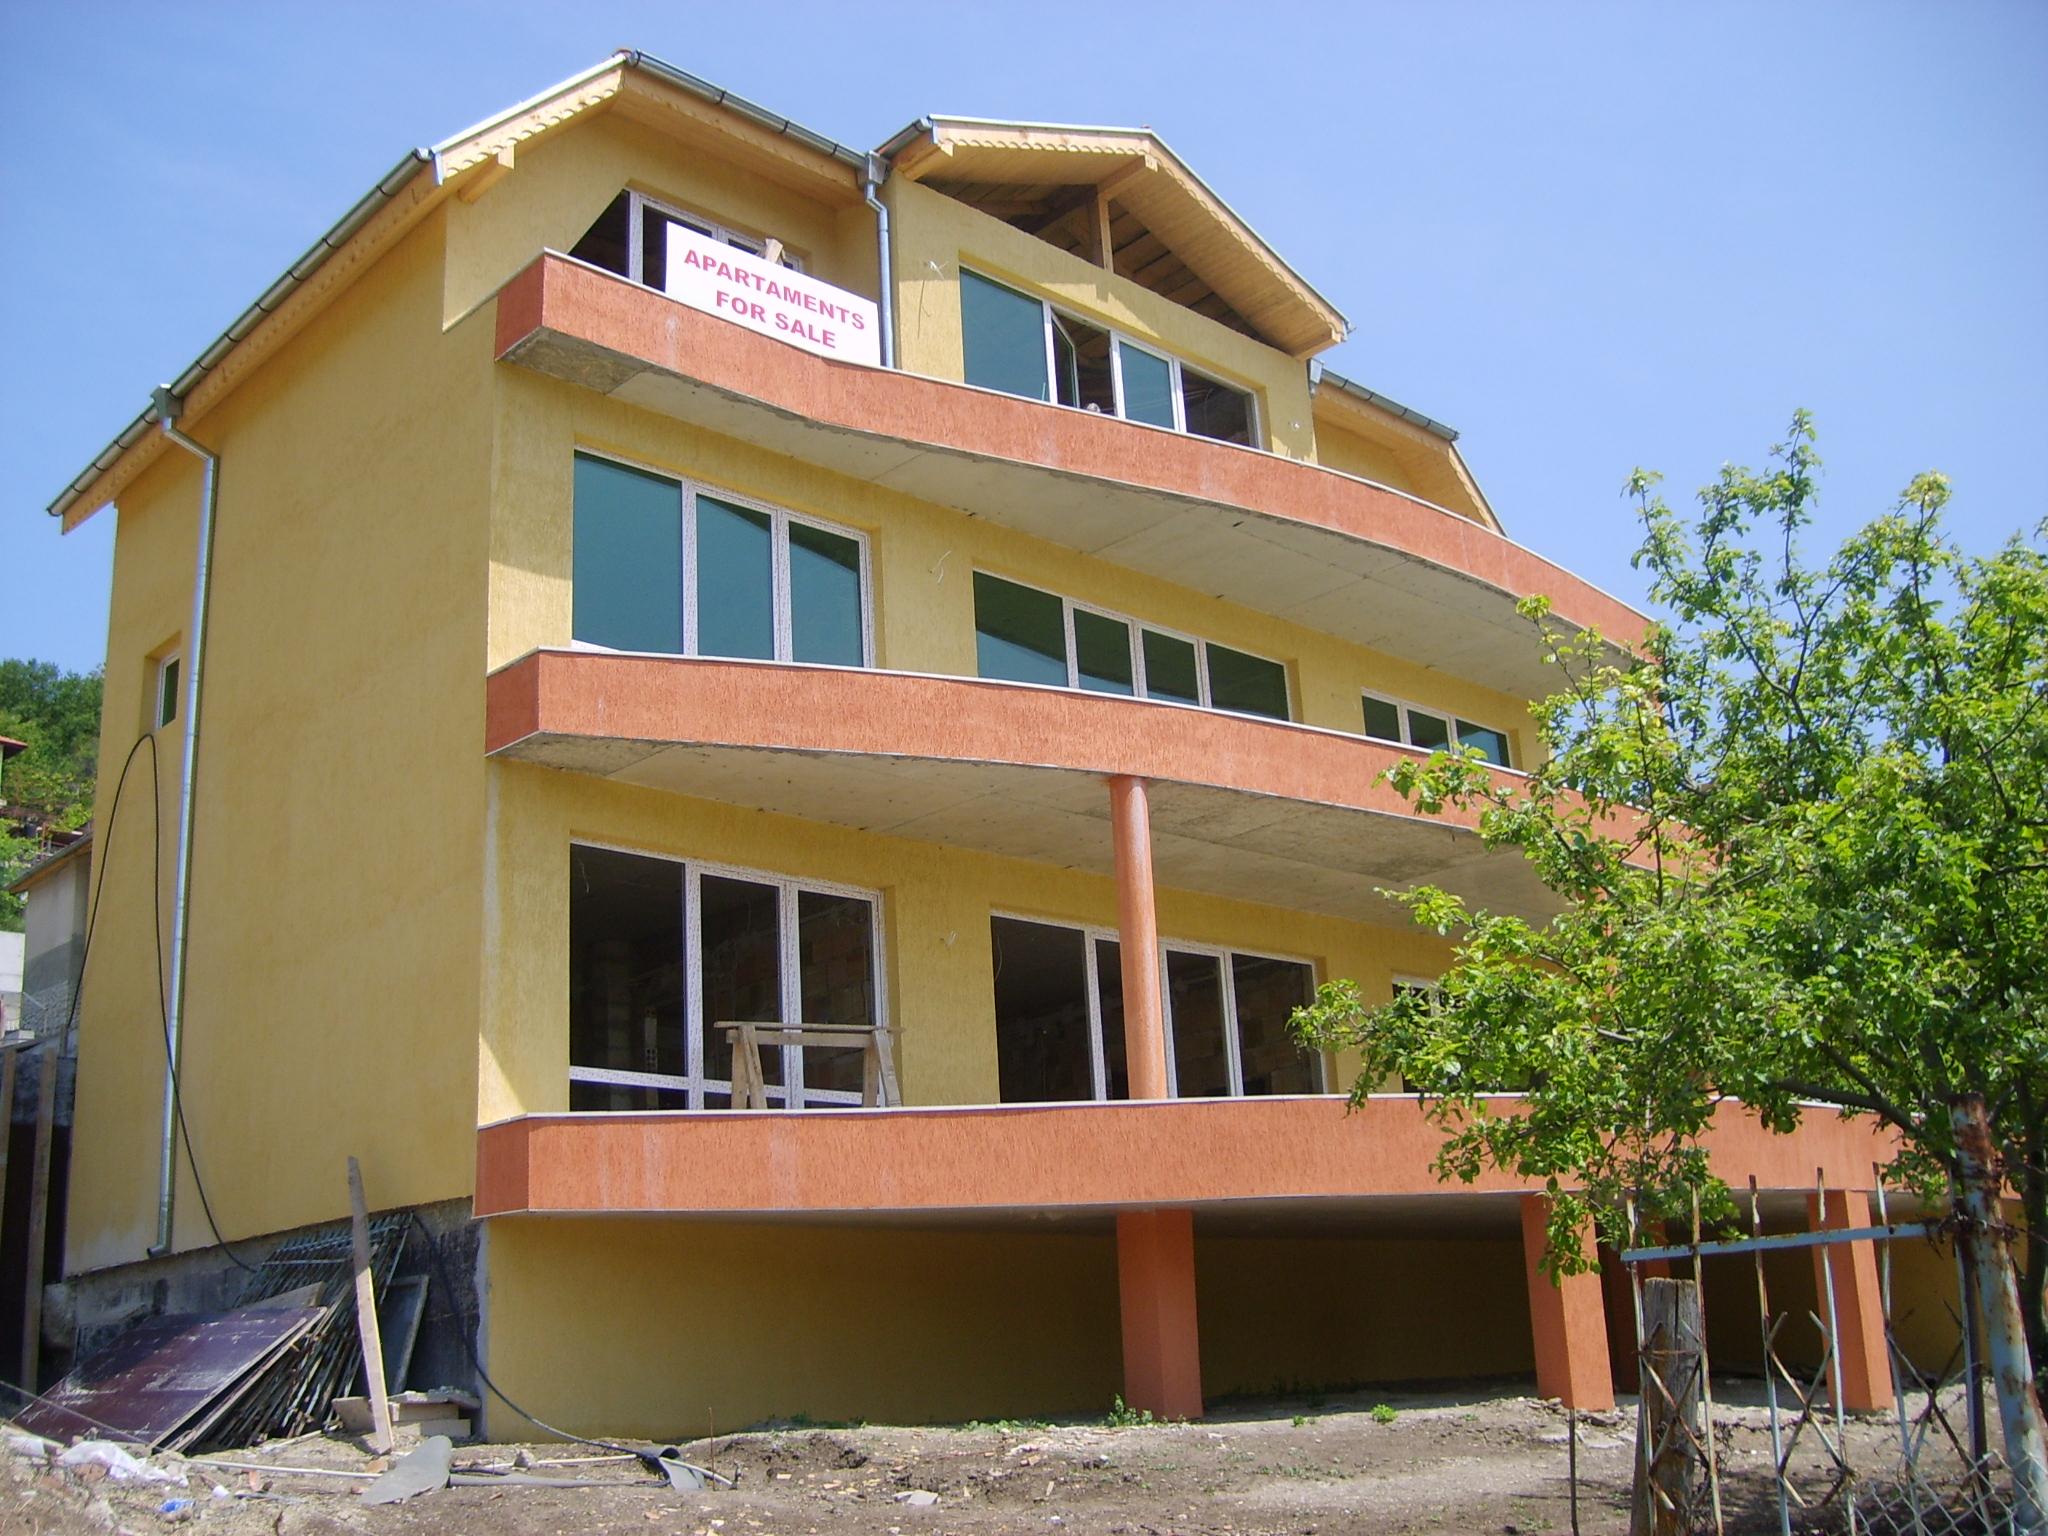 Vente maison ind pendante balchik albena bulgarie 2 9 bulga - Maison independante energetiquement ...